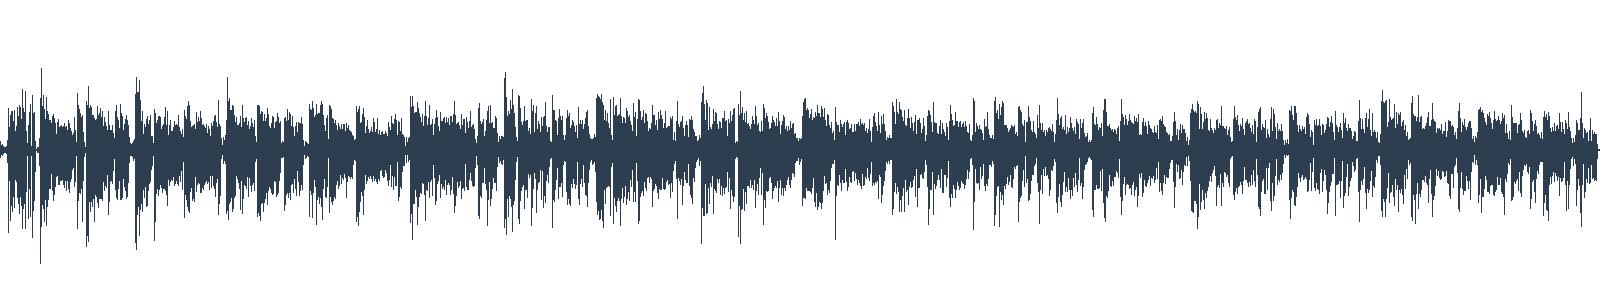 Nové audioknihy 25-26/2019 waveform